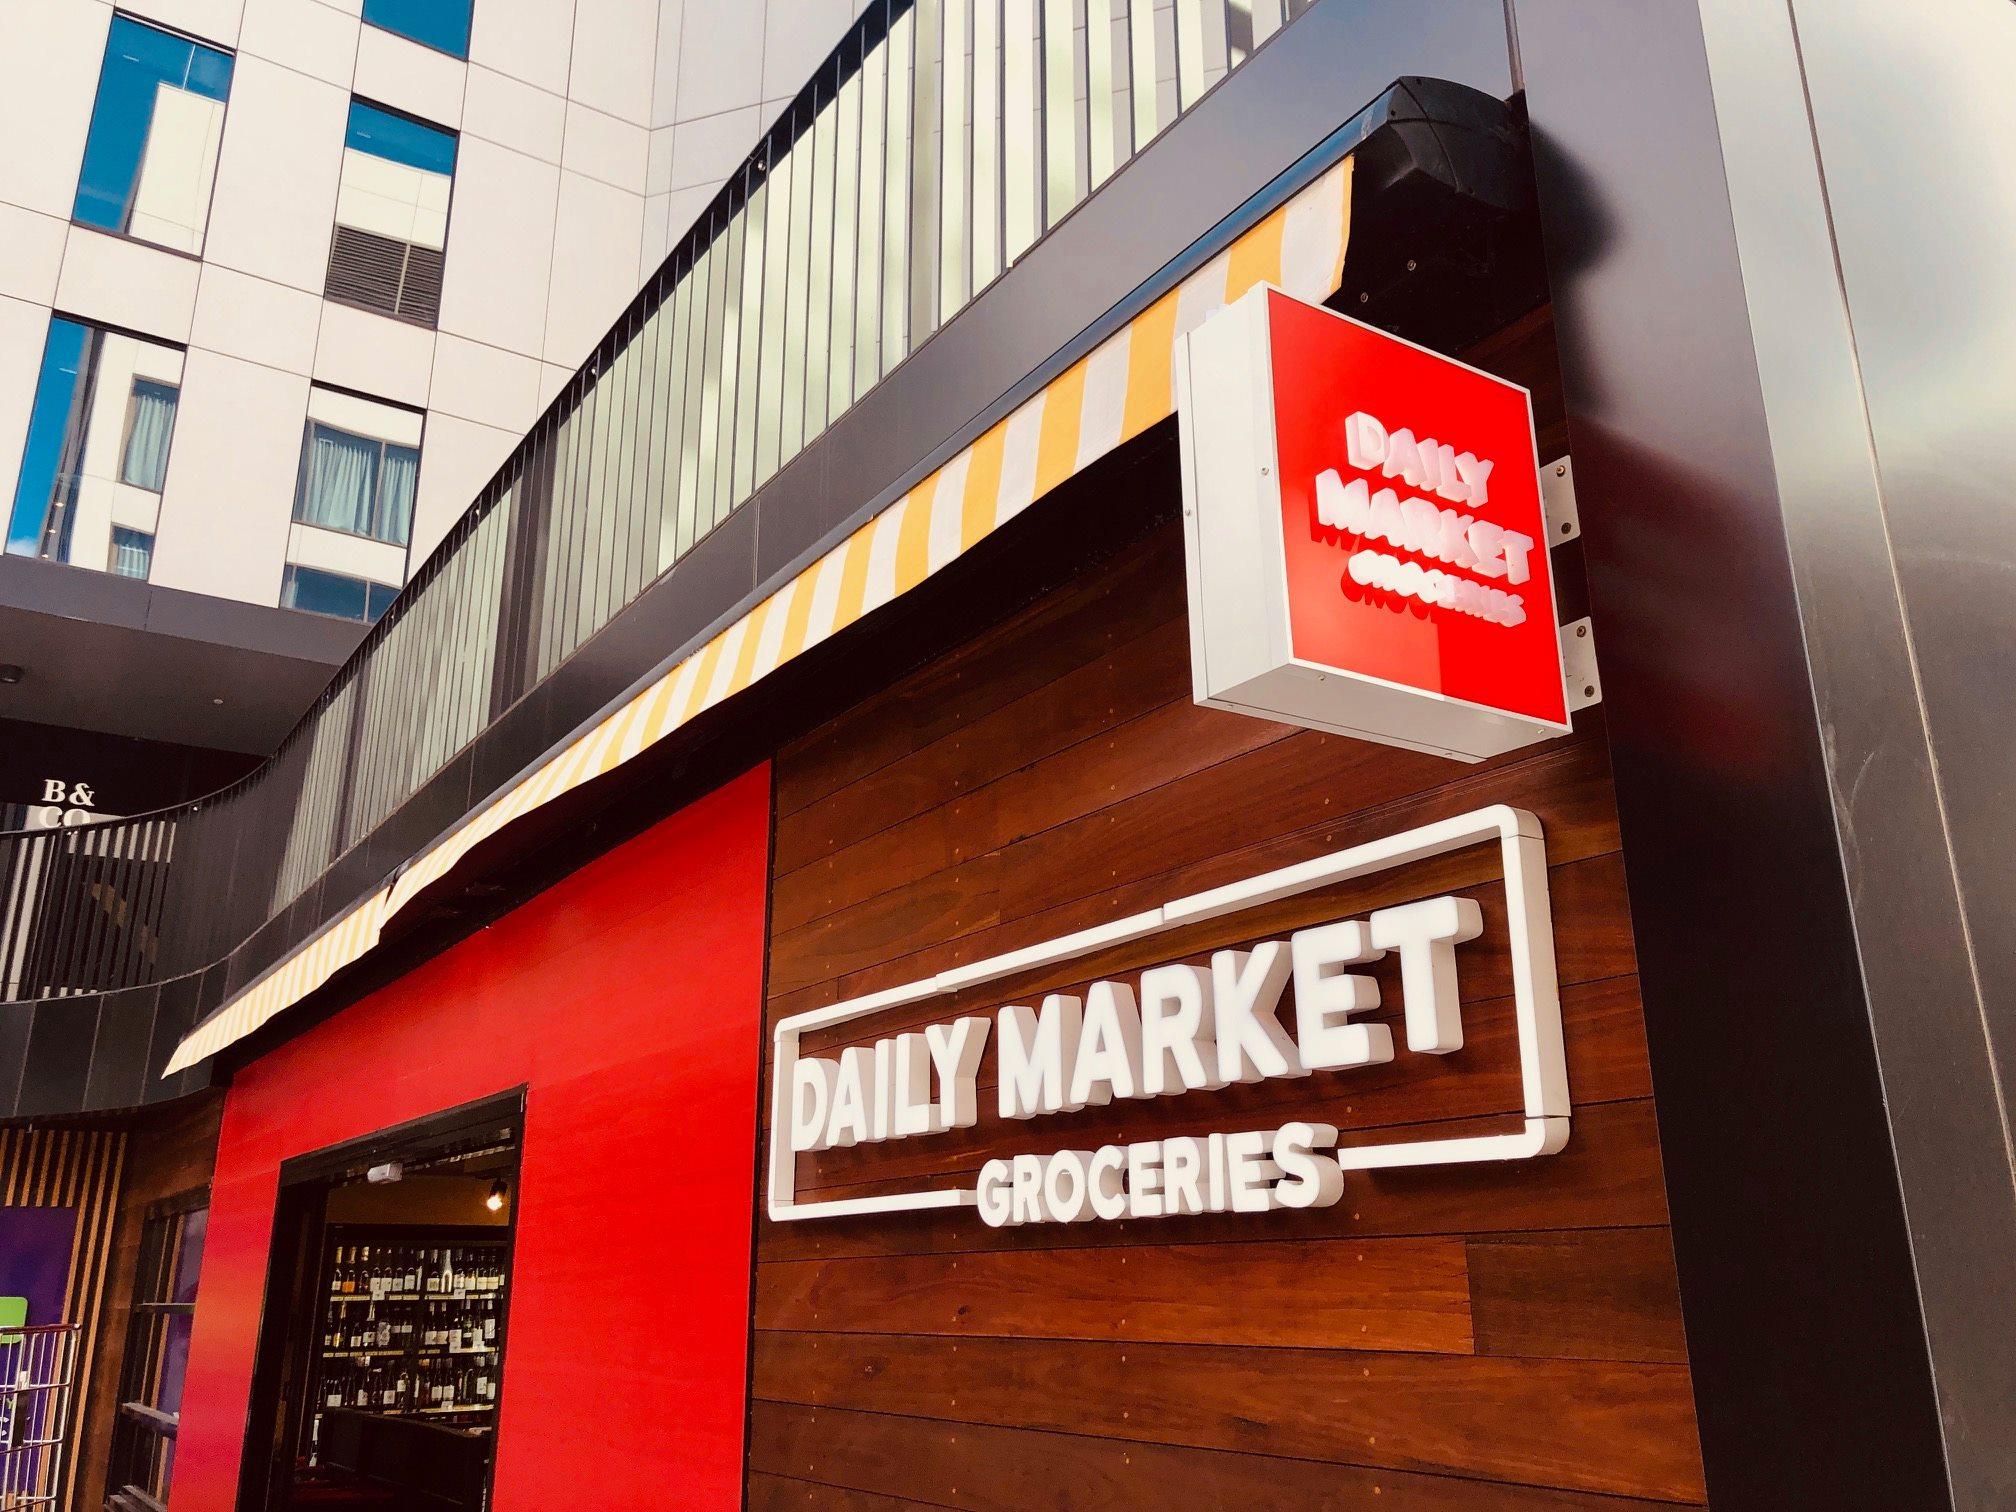 Daily Market at Kambri, Canberra ANU